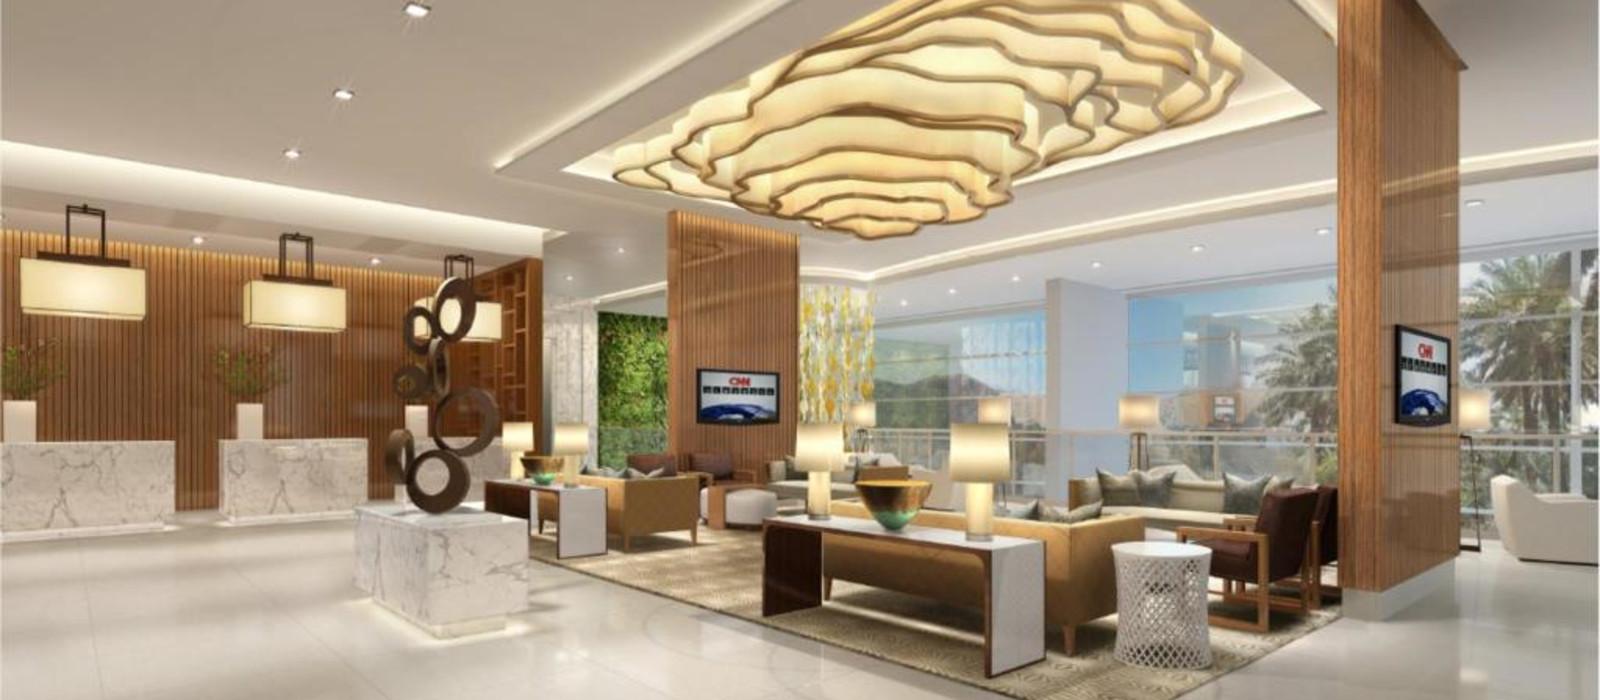 Hotel Crowne Plaza Muscat Oman